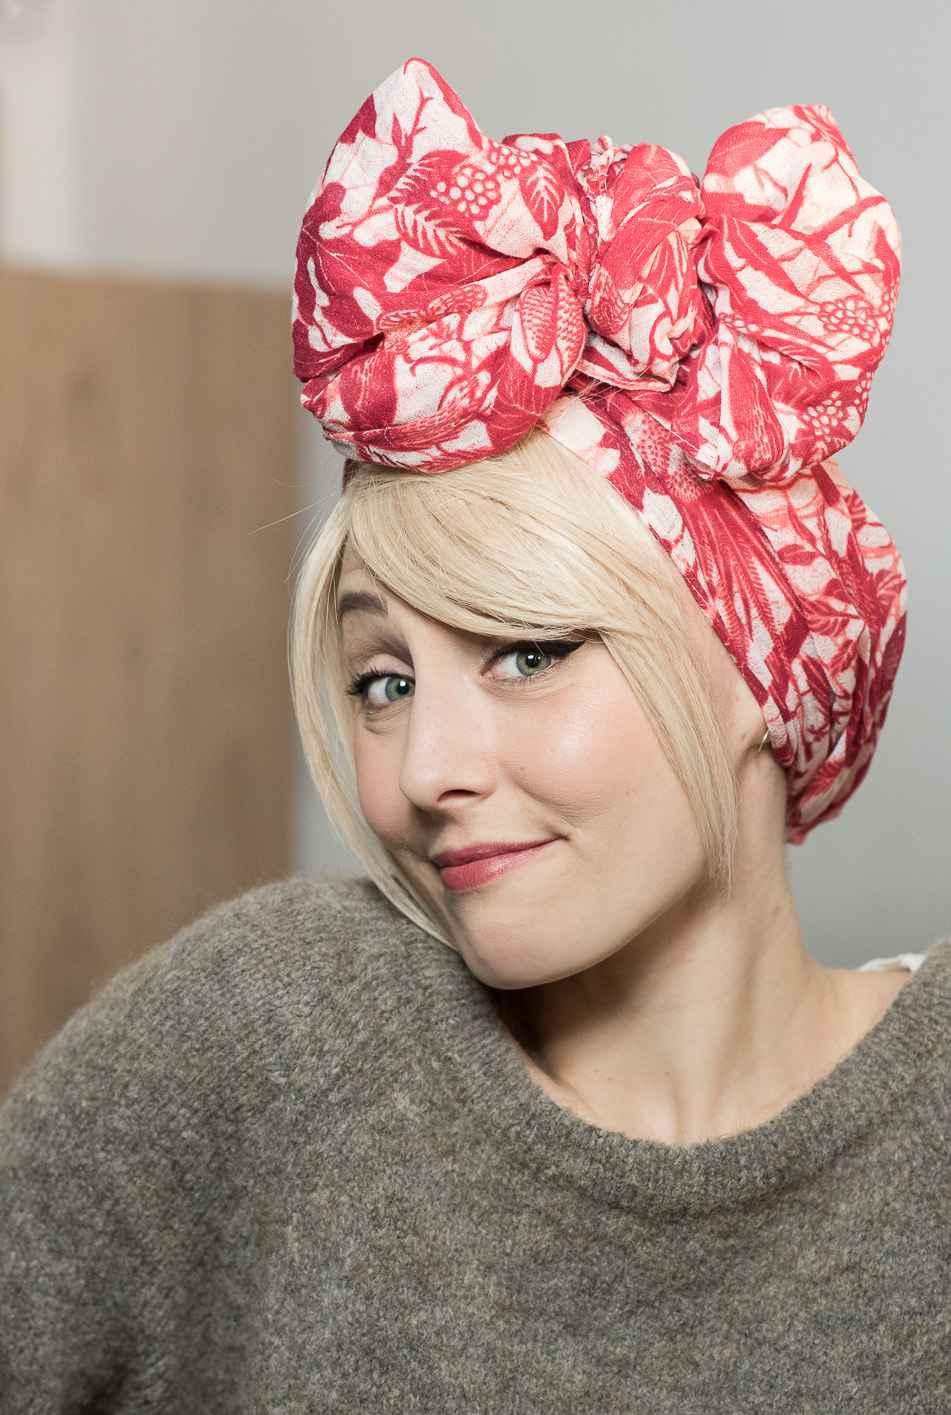 Julie Meunier Les Franjynes foulard - MÊME Cosmetics